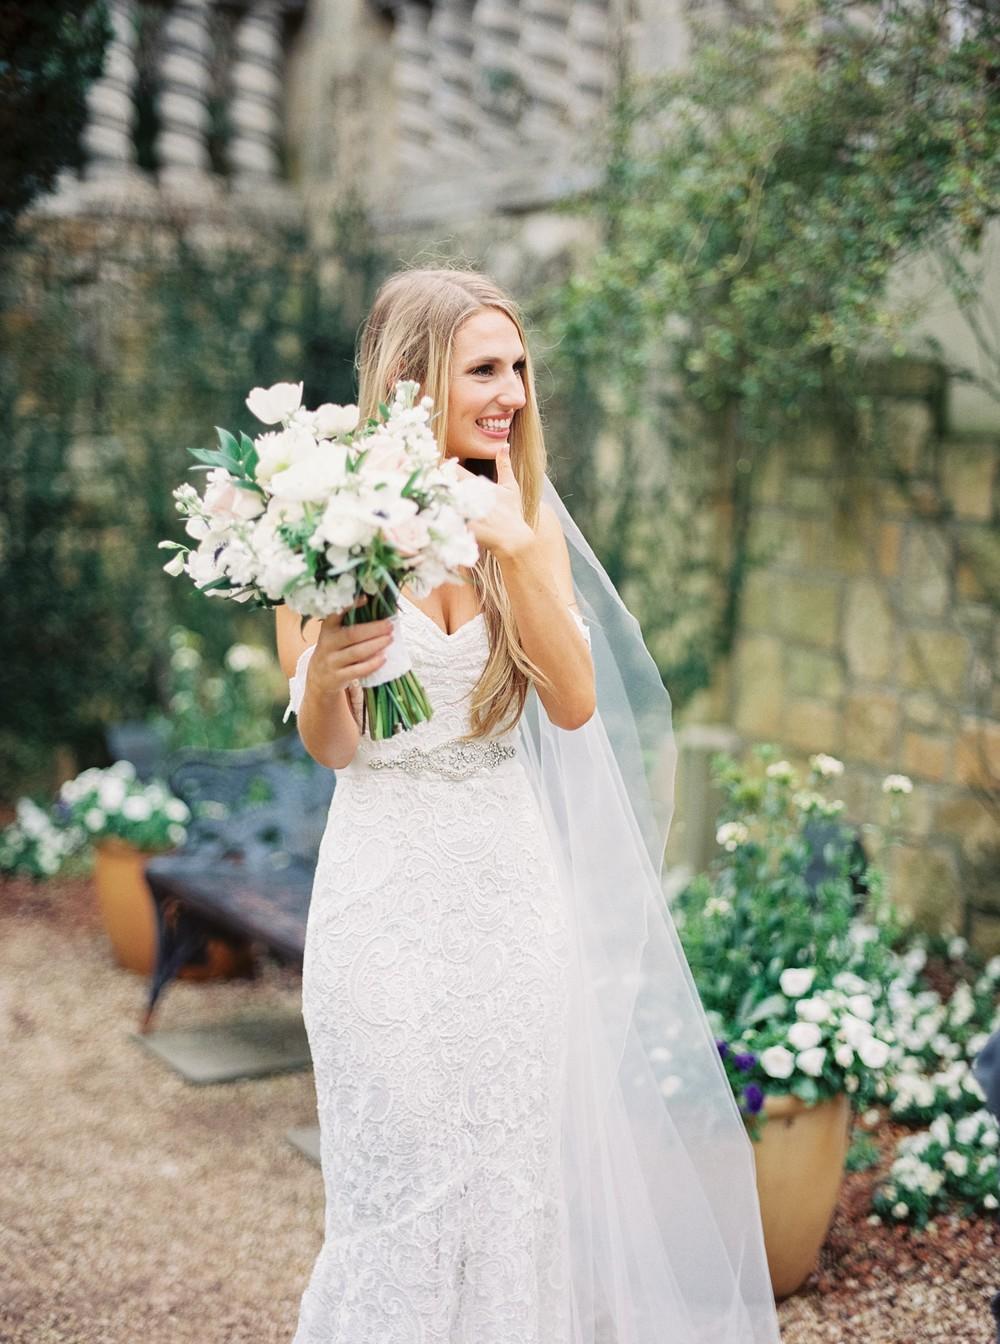 Becca Lea Photography - Dallas Fine Art Film Photographer